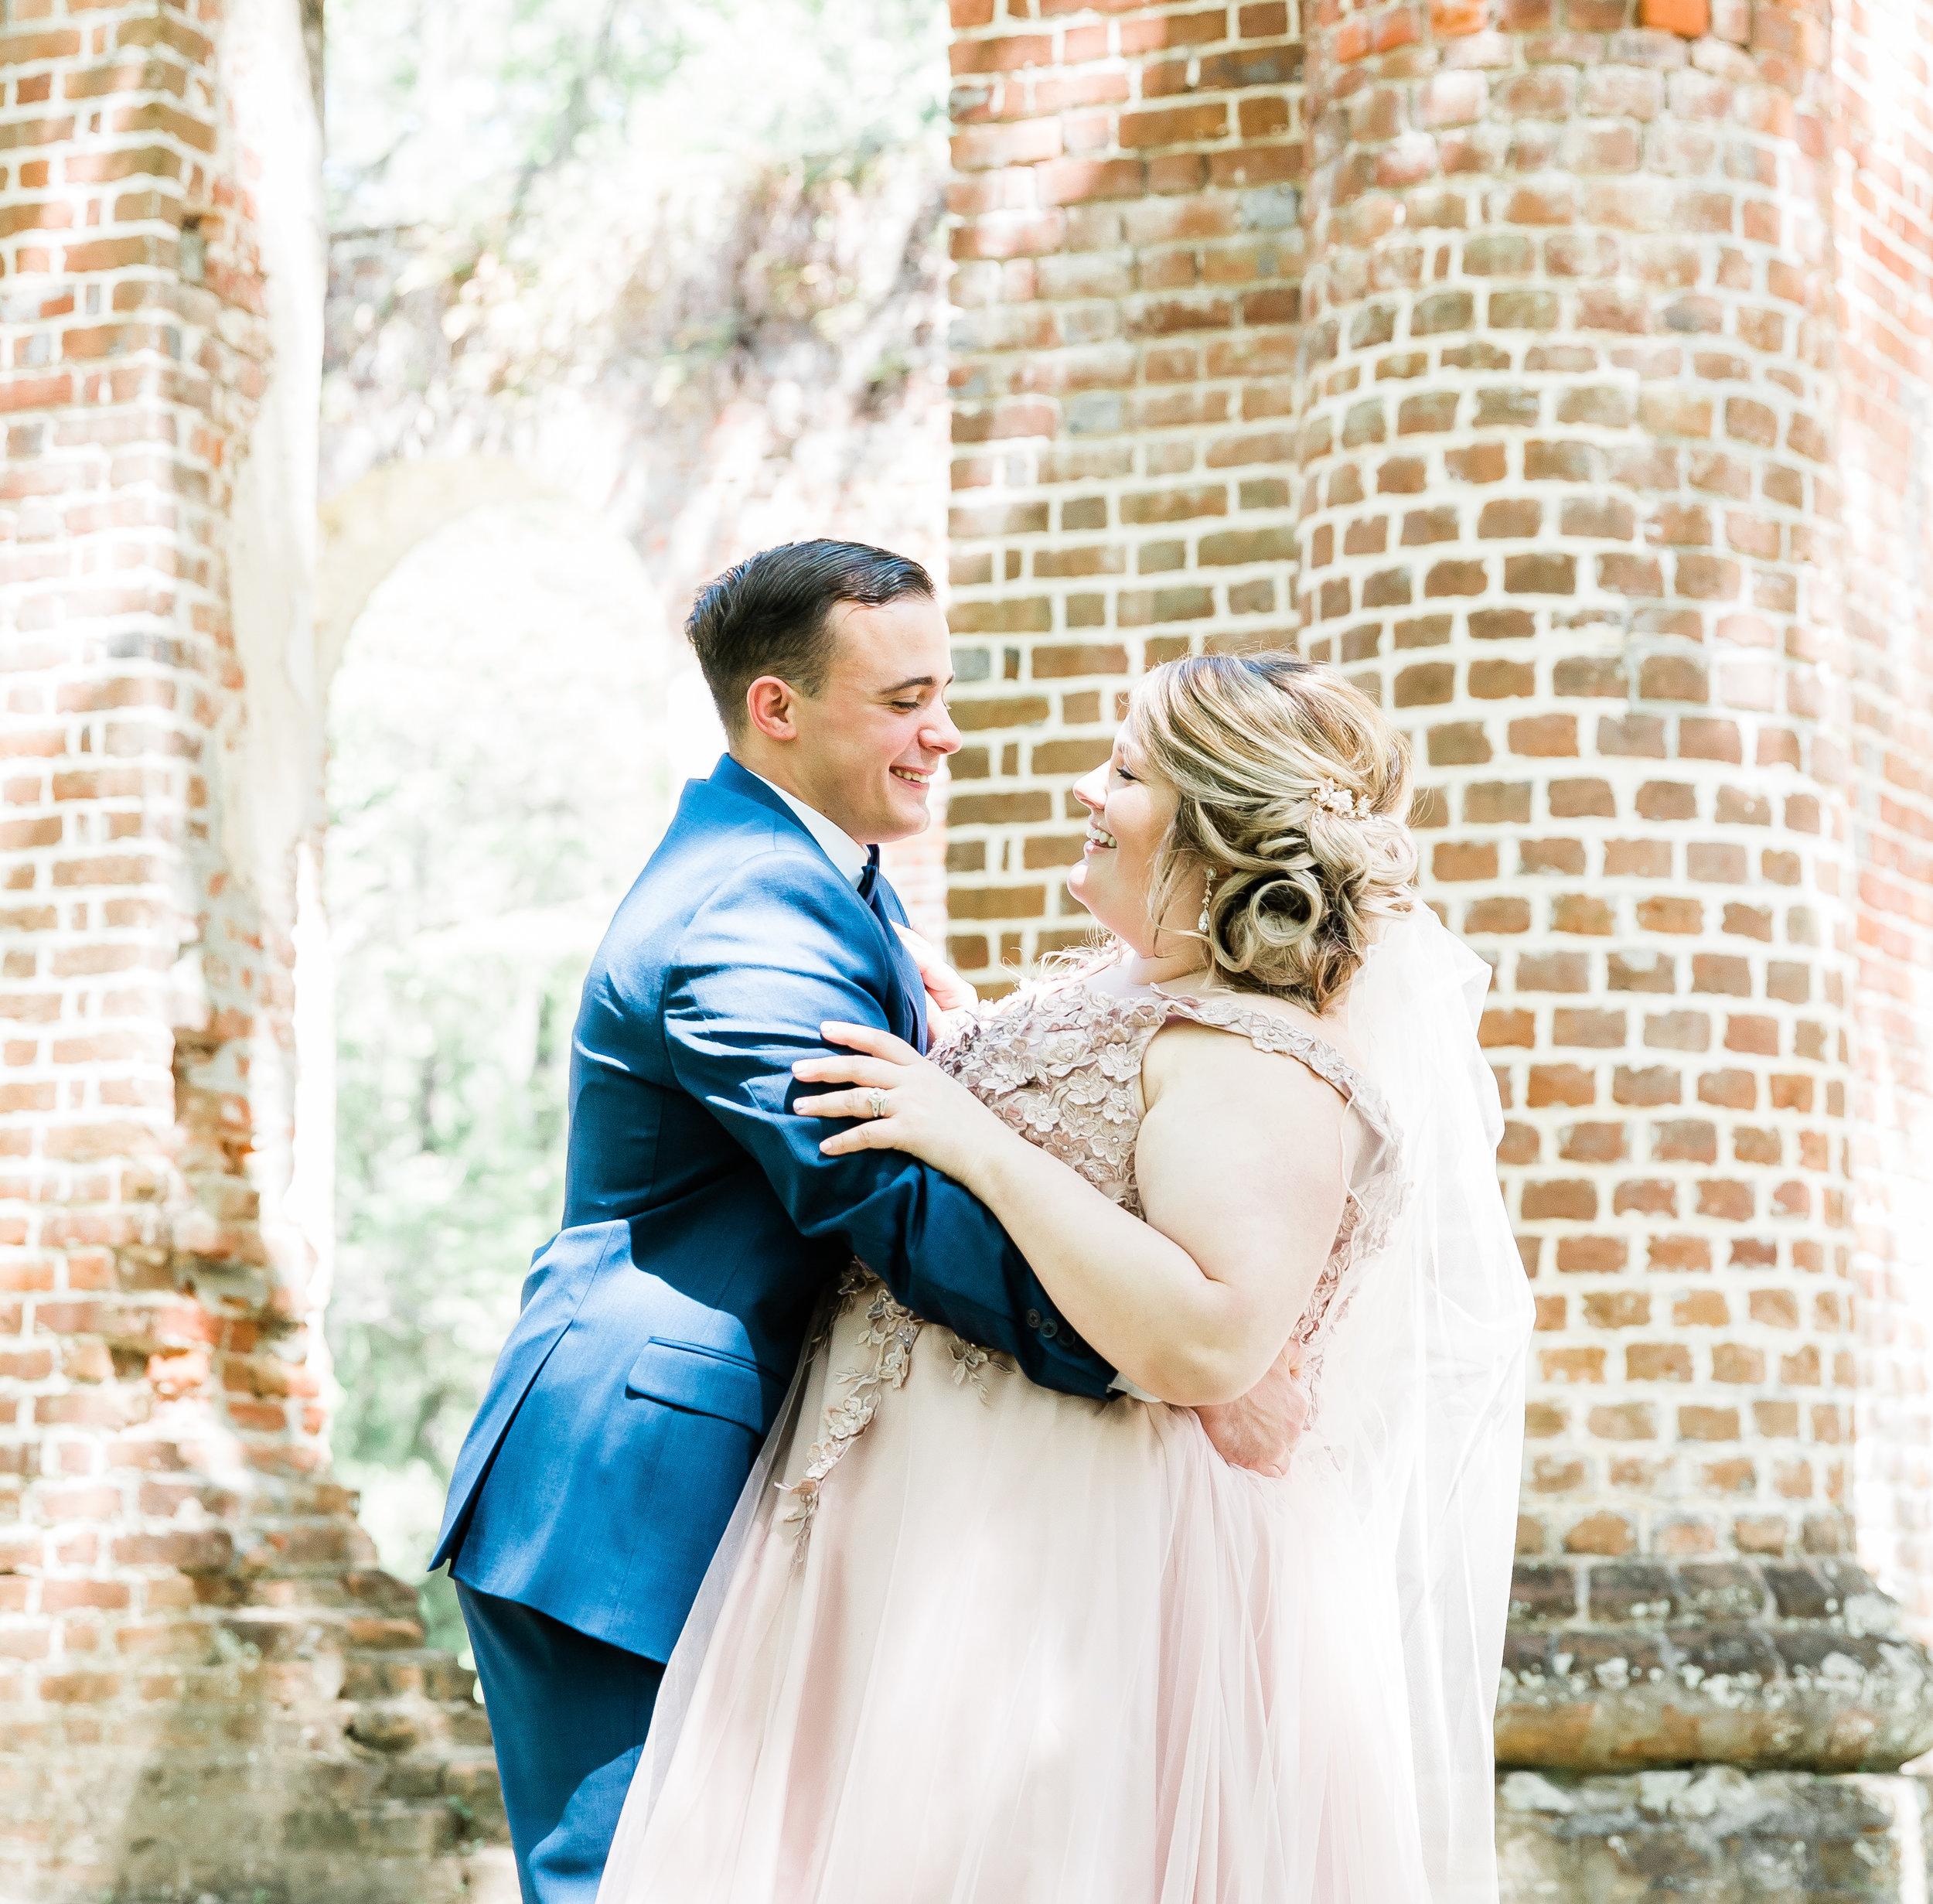 20190417-Southern Lens Photography-savannah family photographer- Ashley and Zack-old sheldon church ruins-201952.jpg